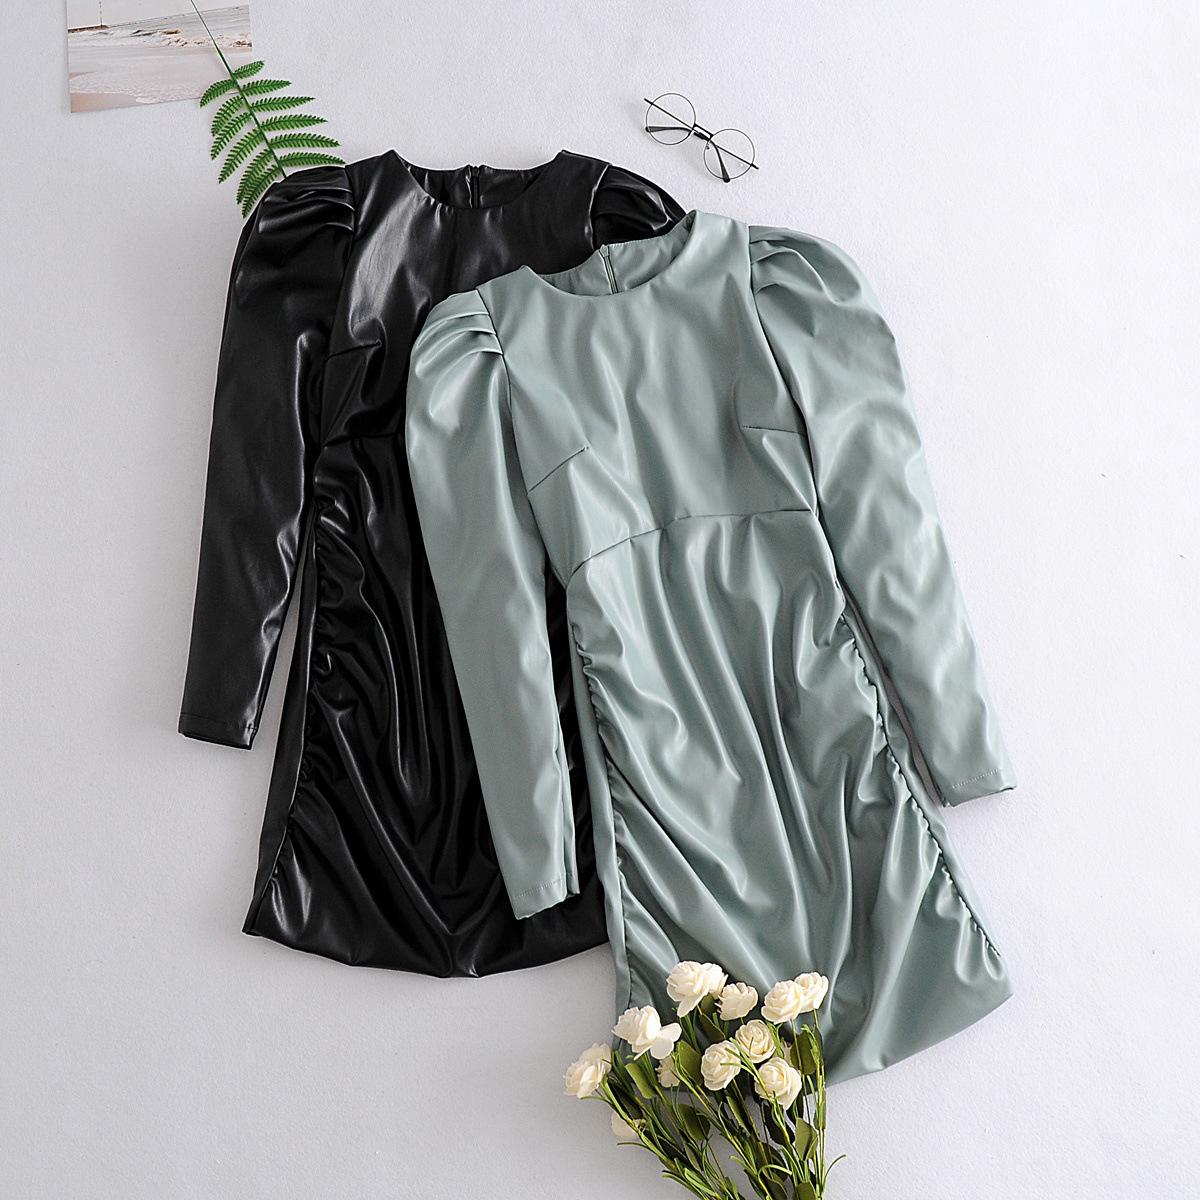 summer double-layer imitation leather long-sleeved dress wholesale nihaojewelry NHAM225835